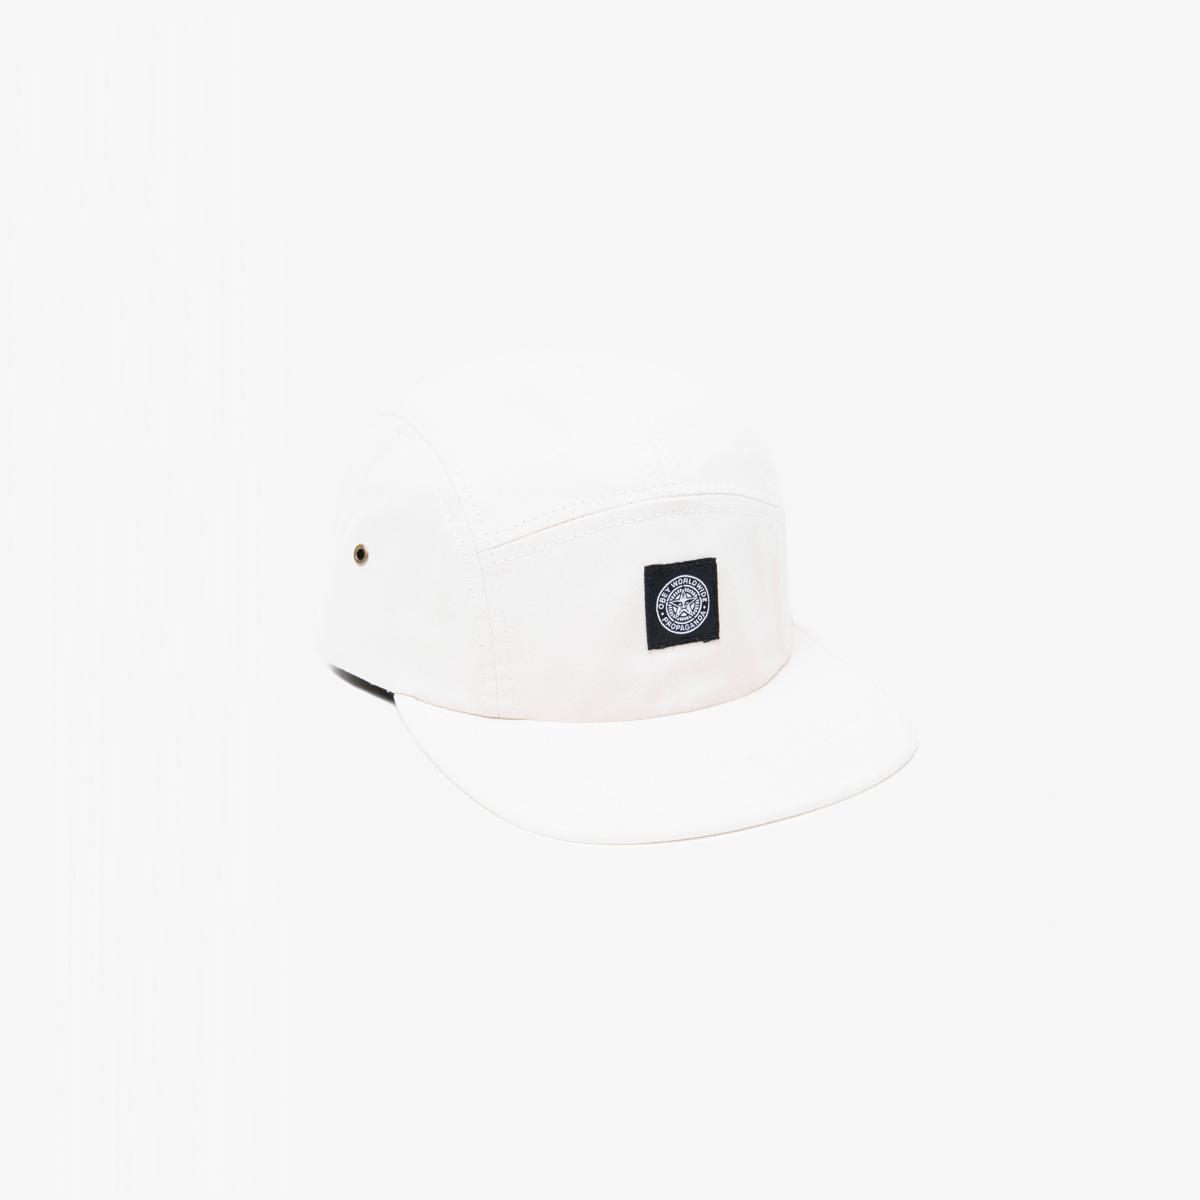 Bílá kšiltovka OBEY Clothing - Tomas 5 Panel